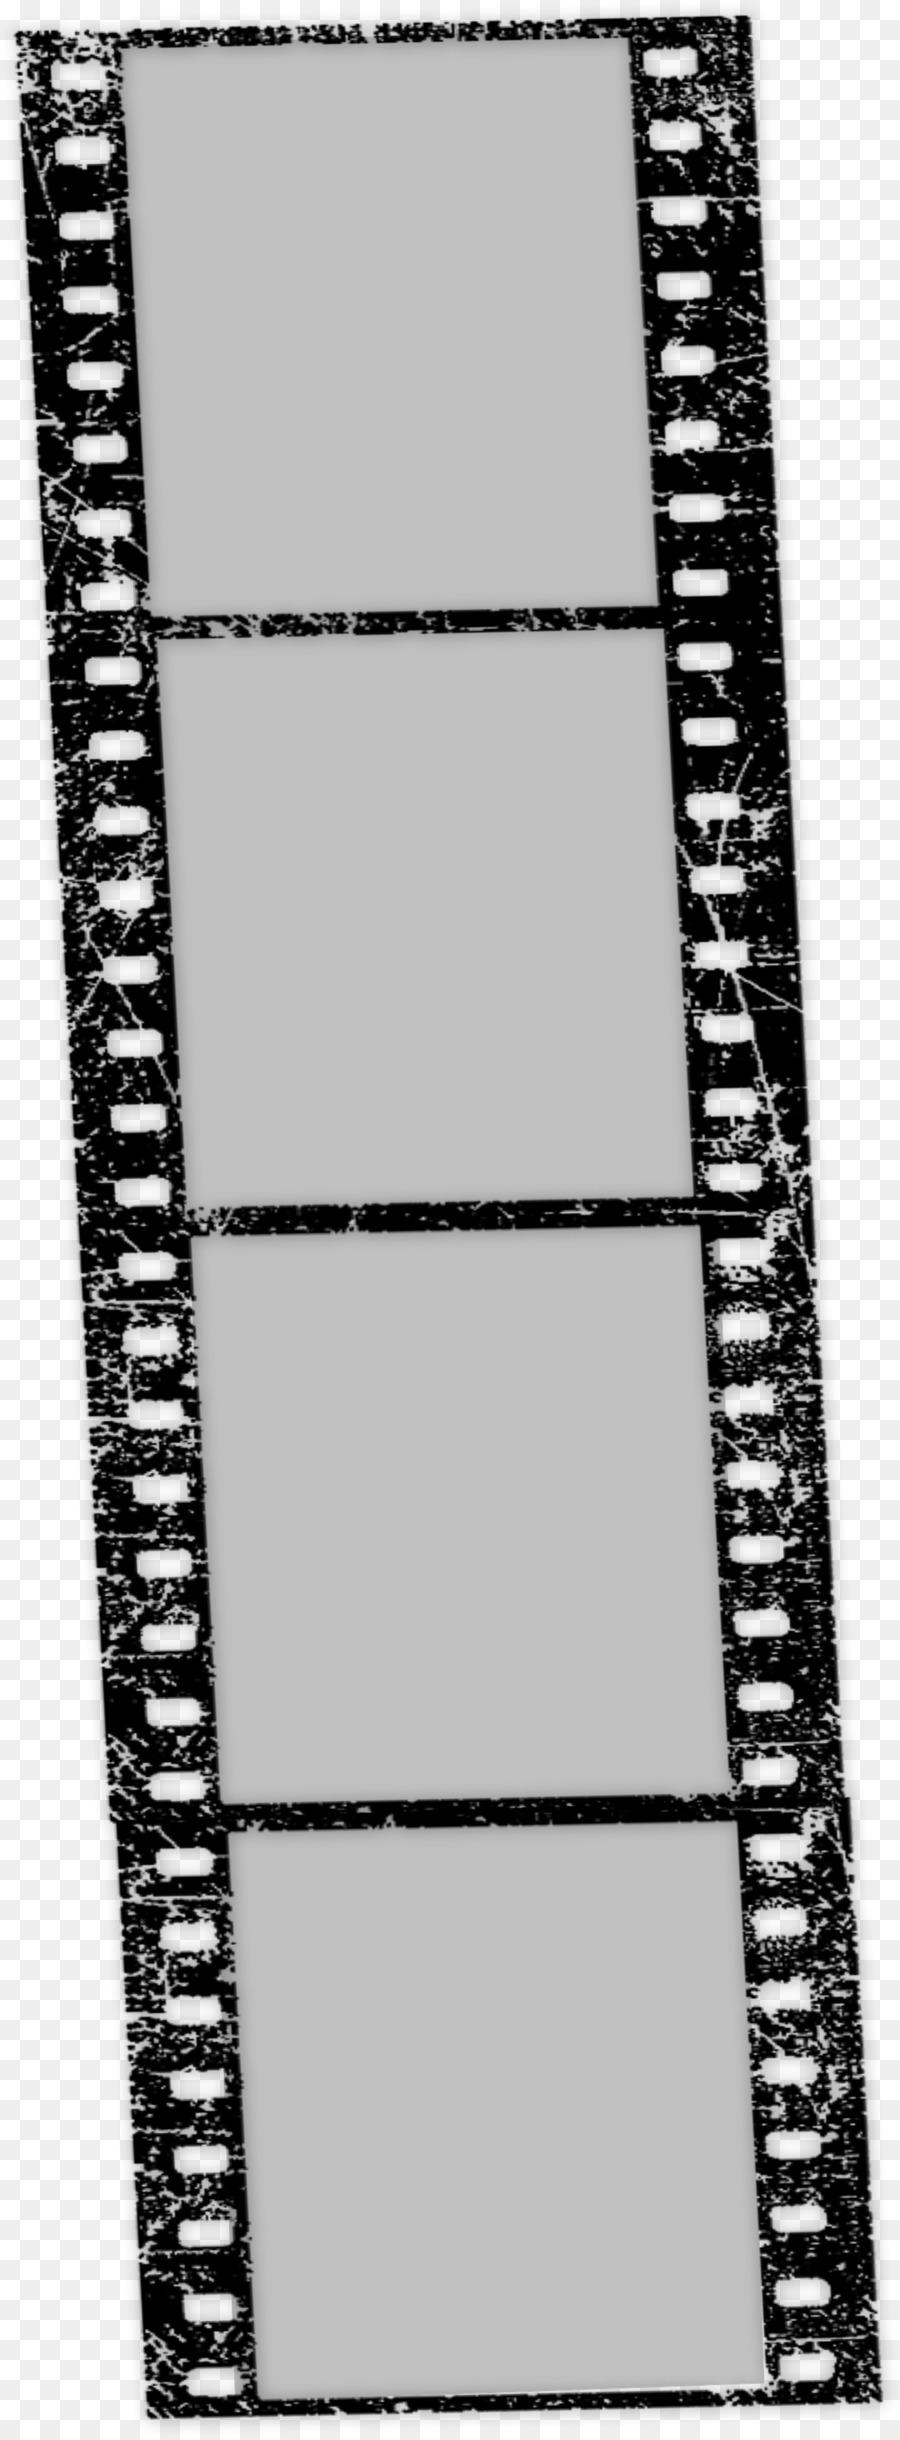 Film frame Photography - filmstrip png download - 1371*3712 - Free ...